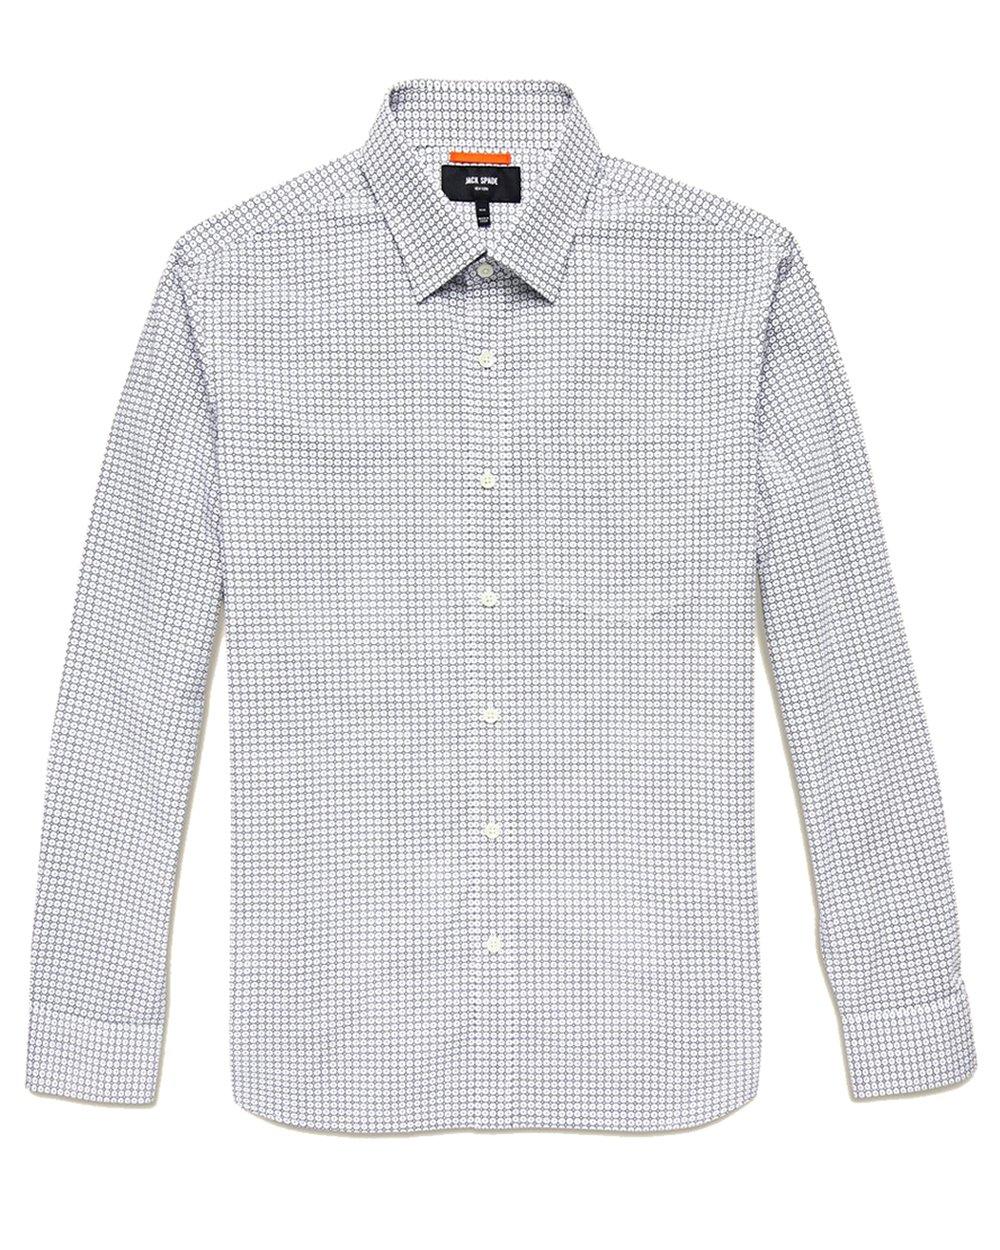 Jack Spade Men's Marrakech Print Poplin Shirt (White, Medium)